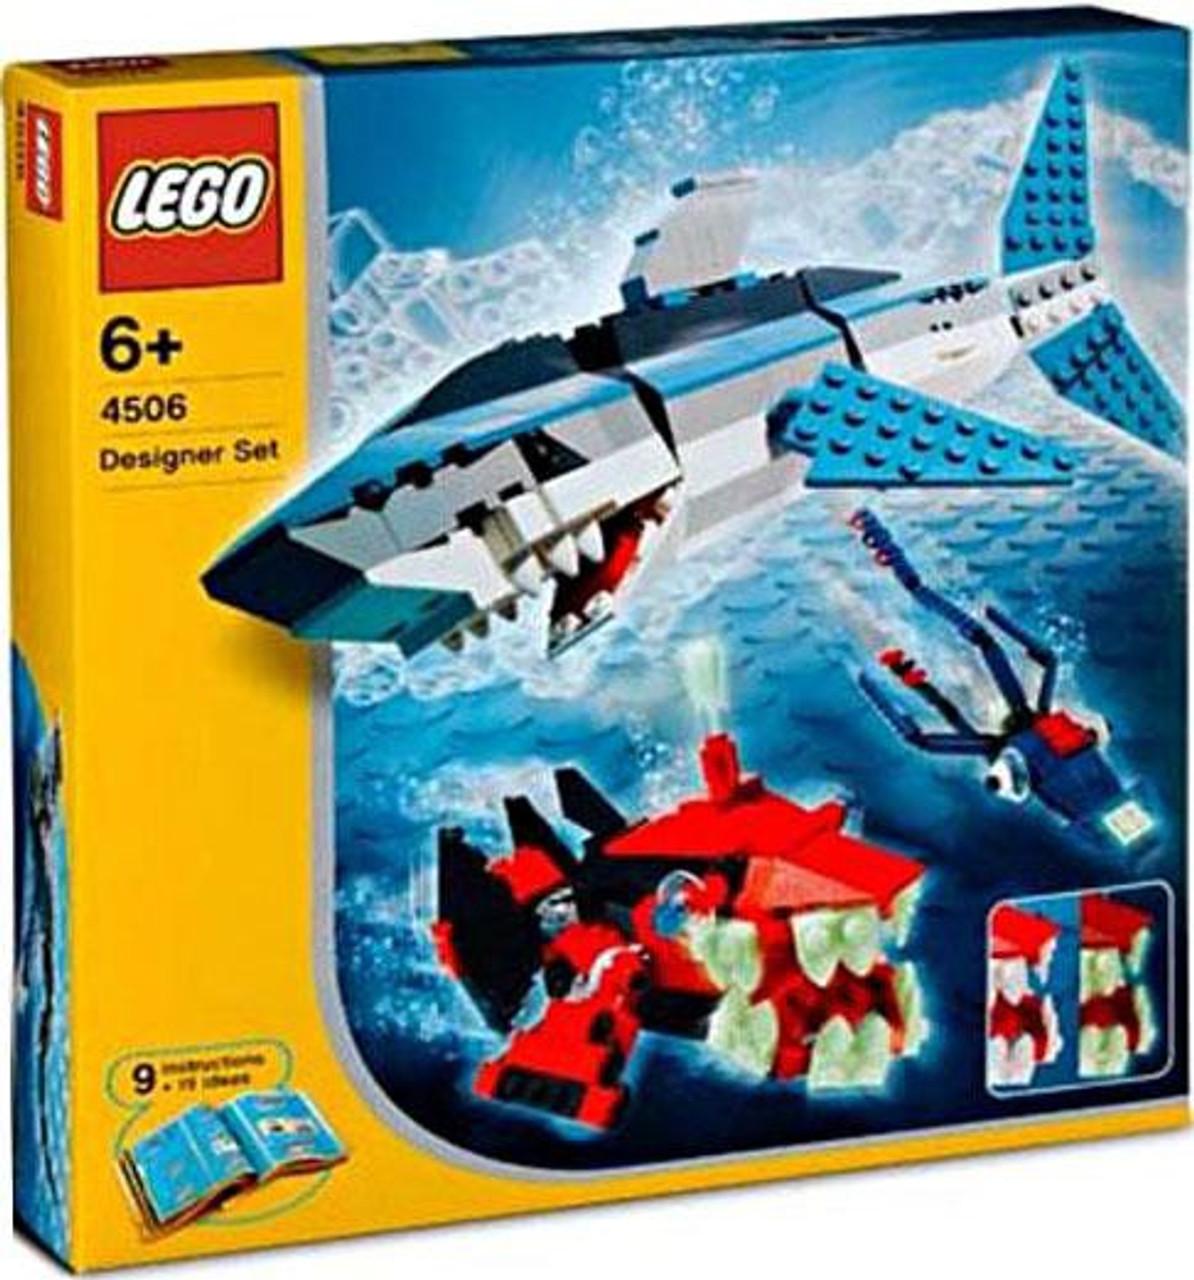 LEGO Deep Sea Predators Set #4506